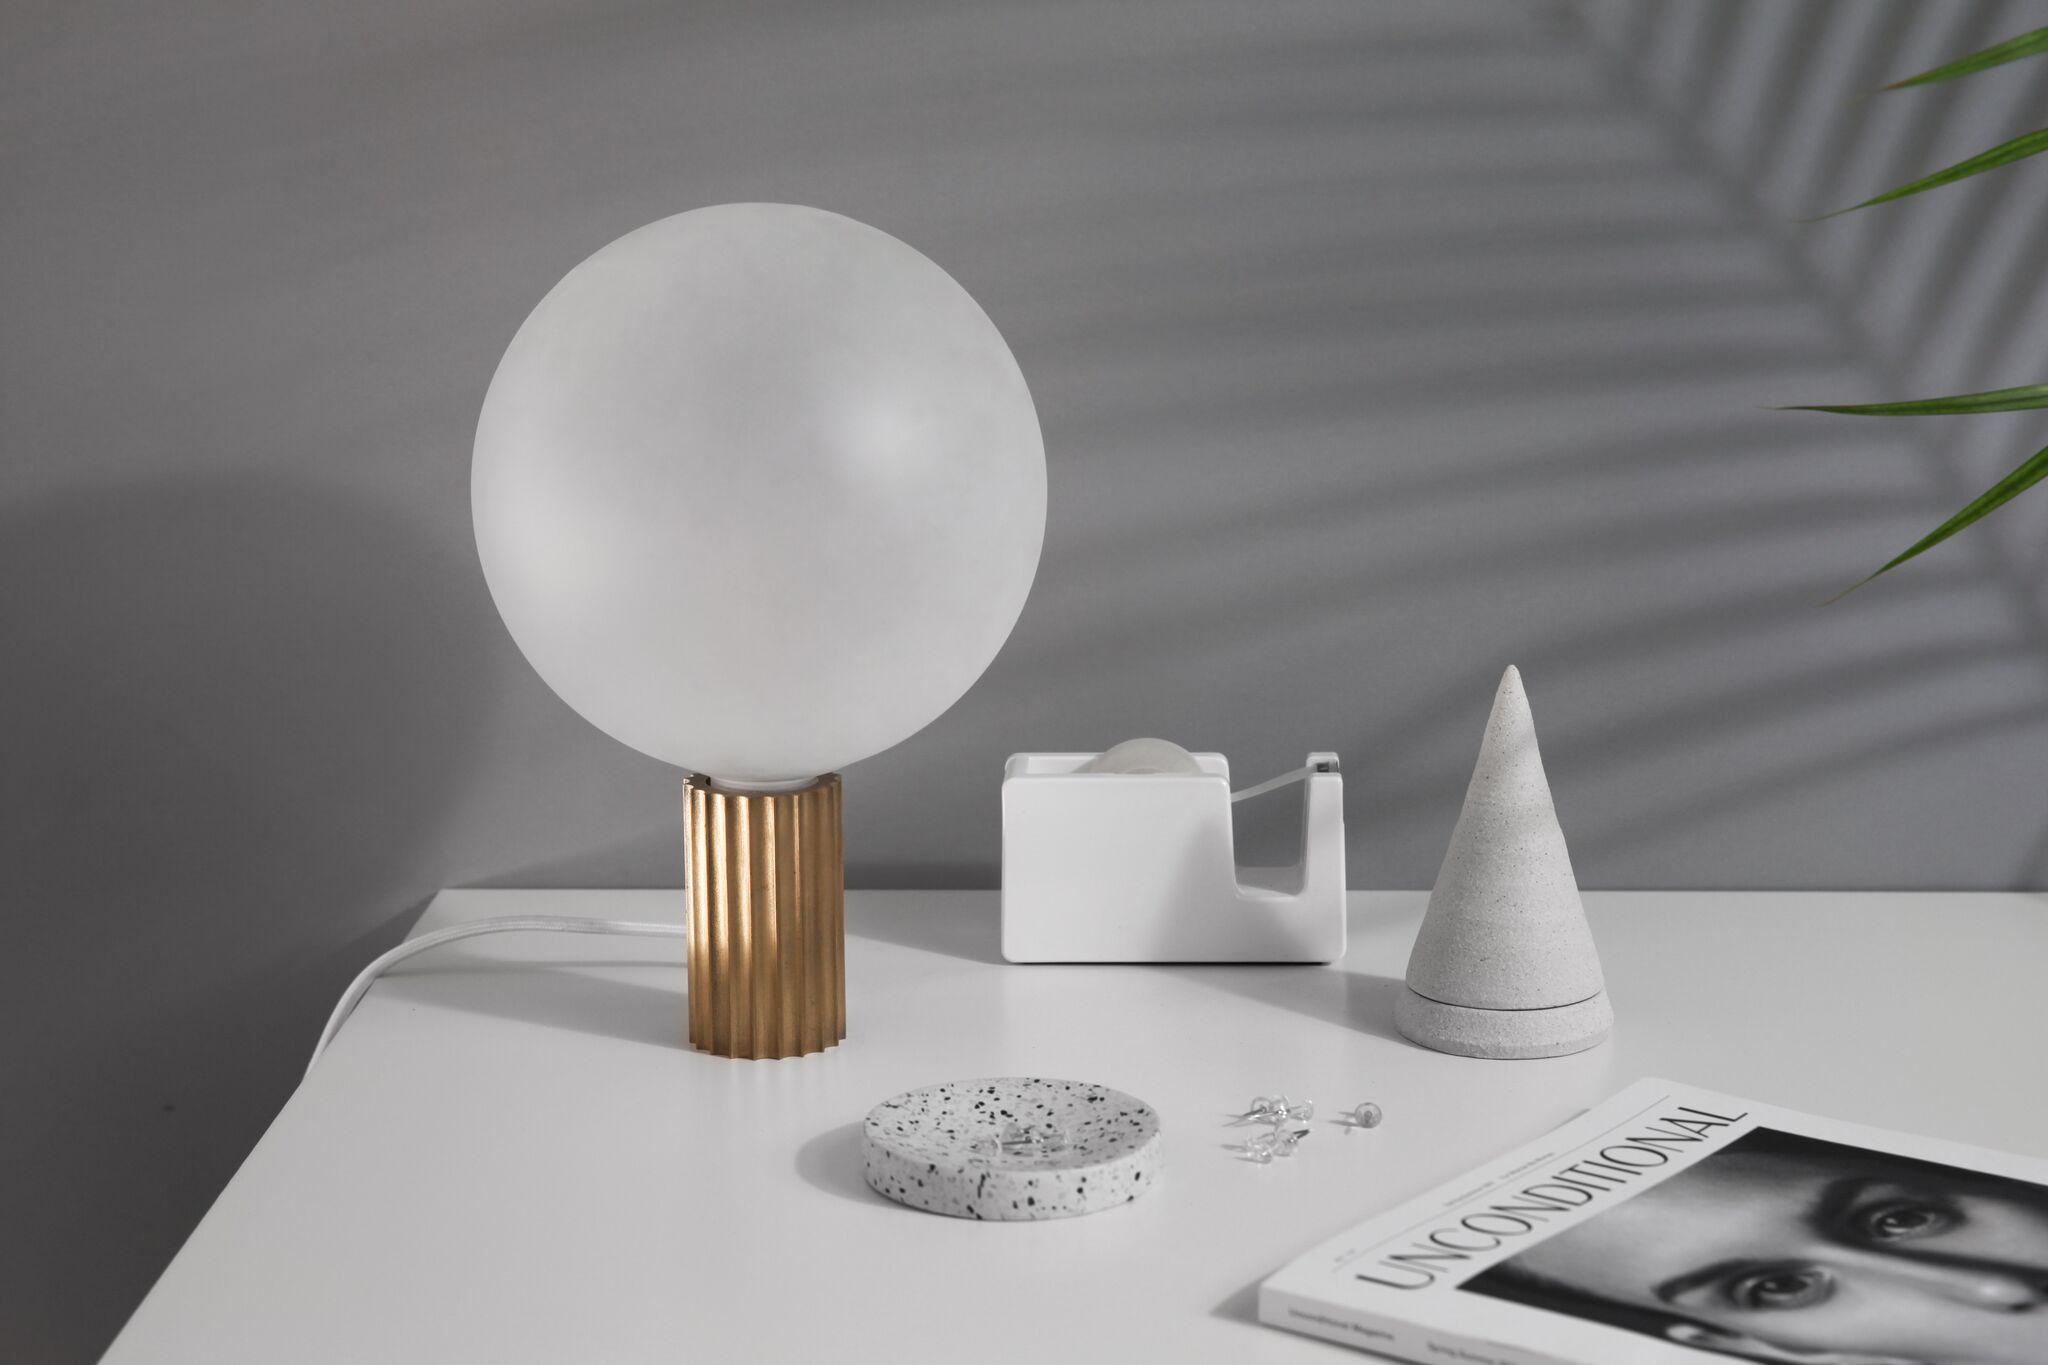 Attalos Lights By Marz Designs Local Australian Industrial & Object Design Bronte, Sydney Image 7